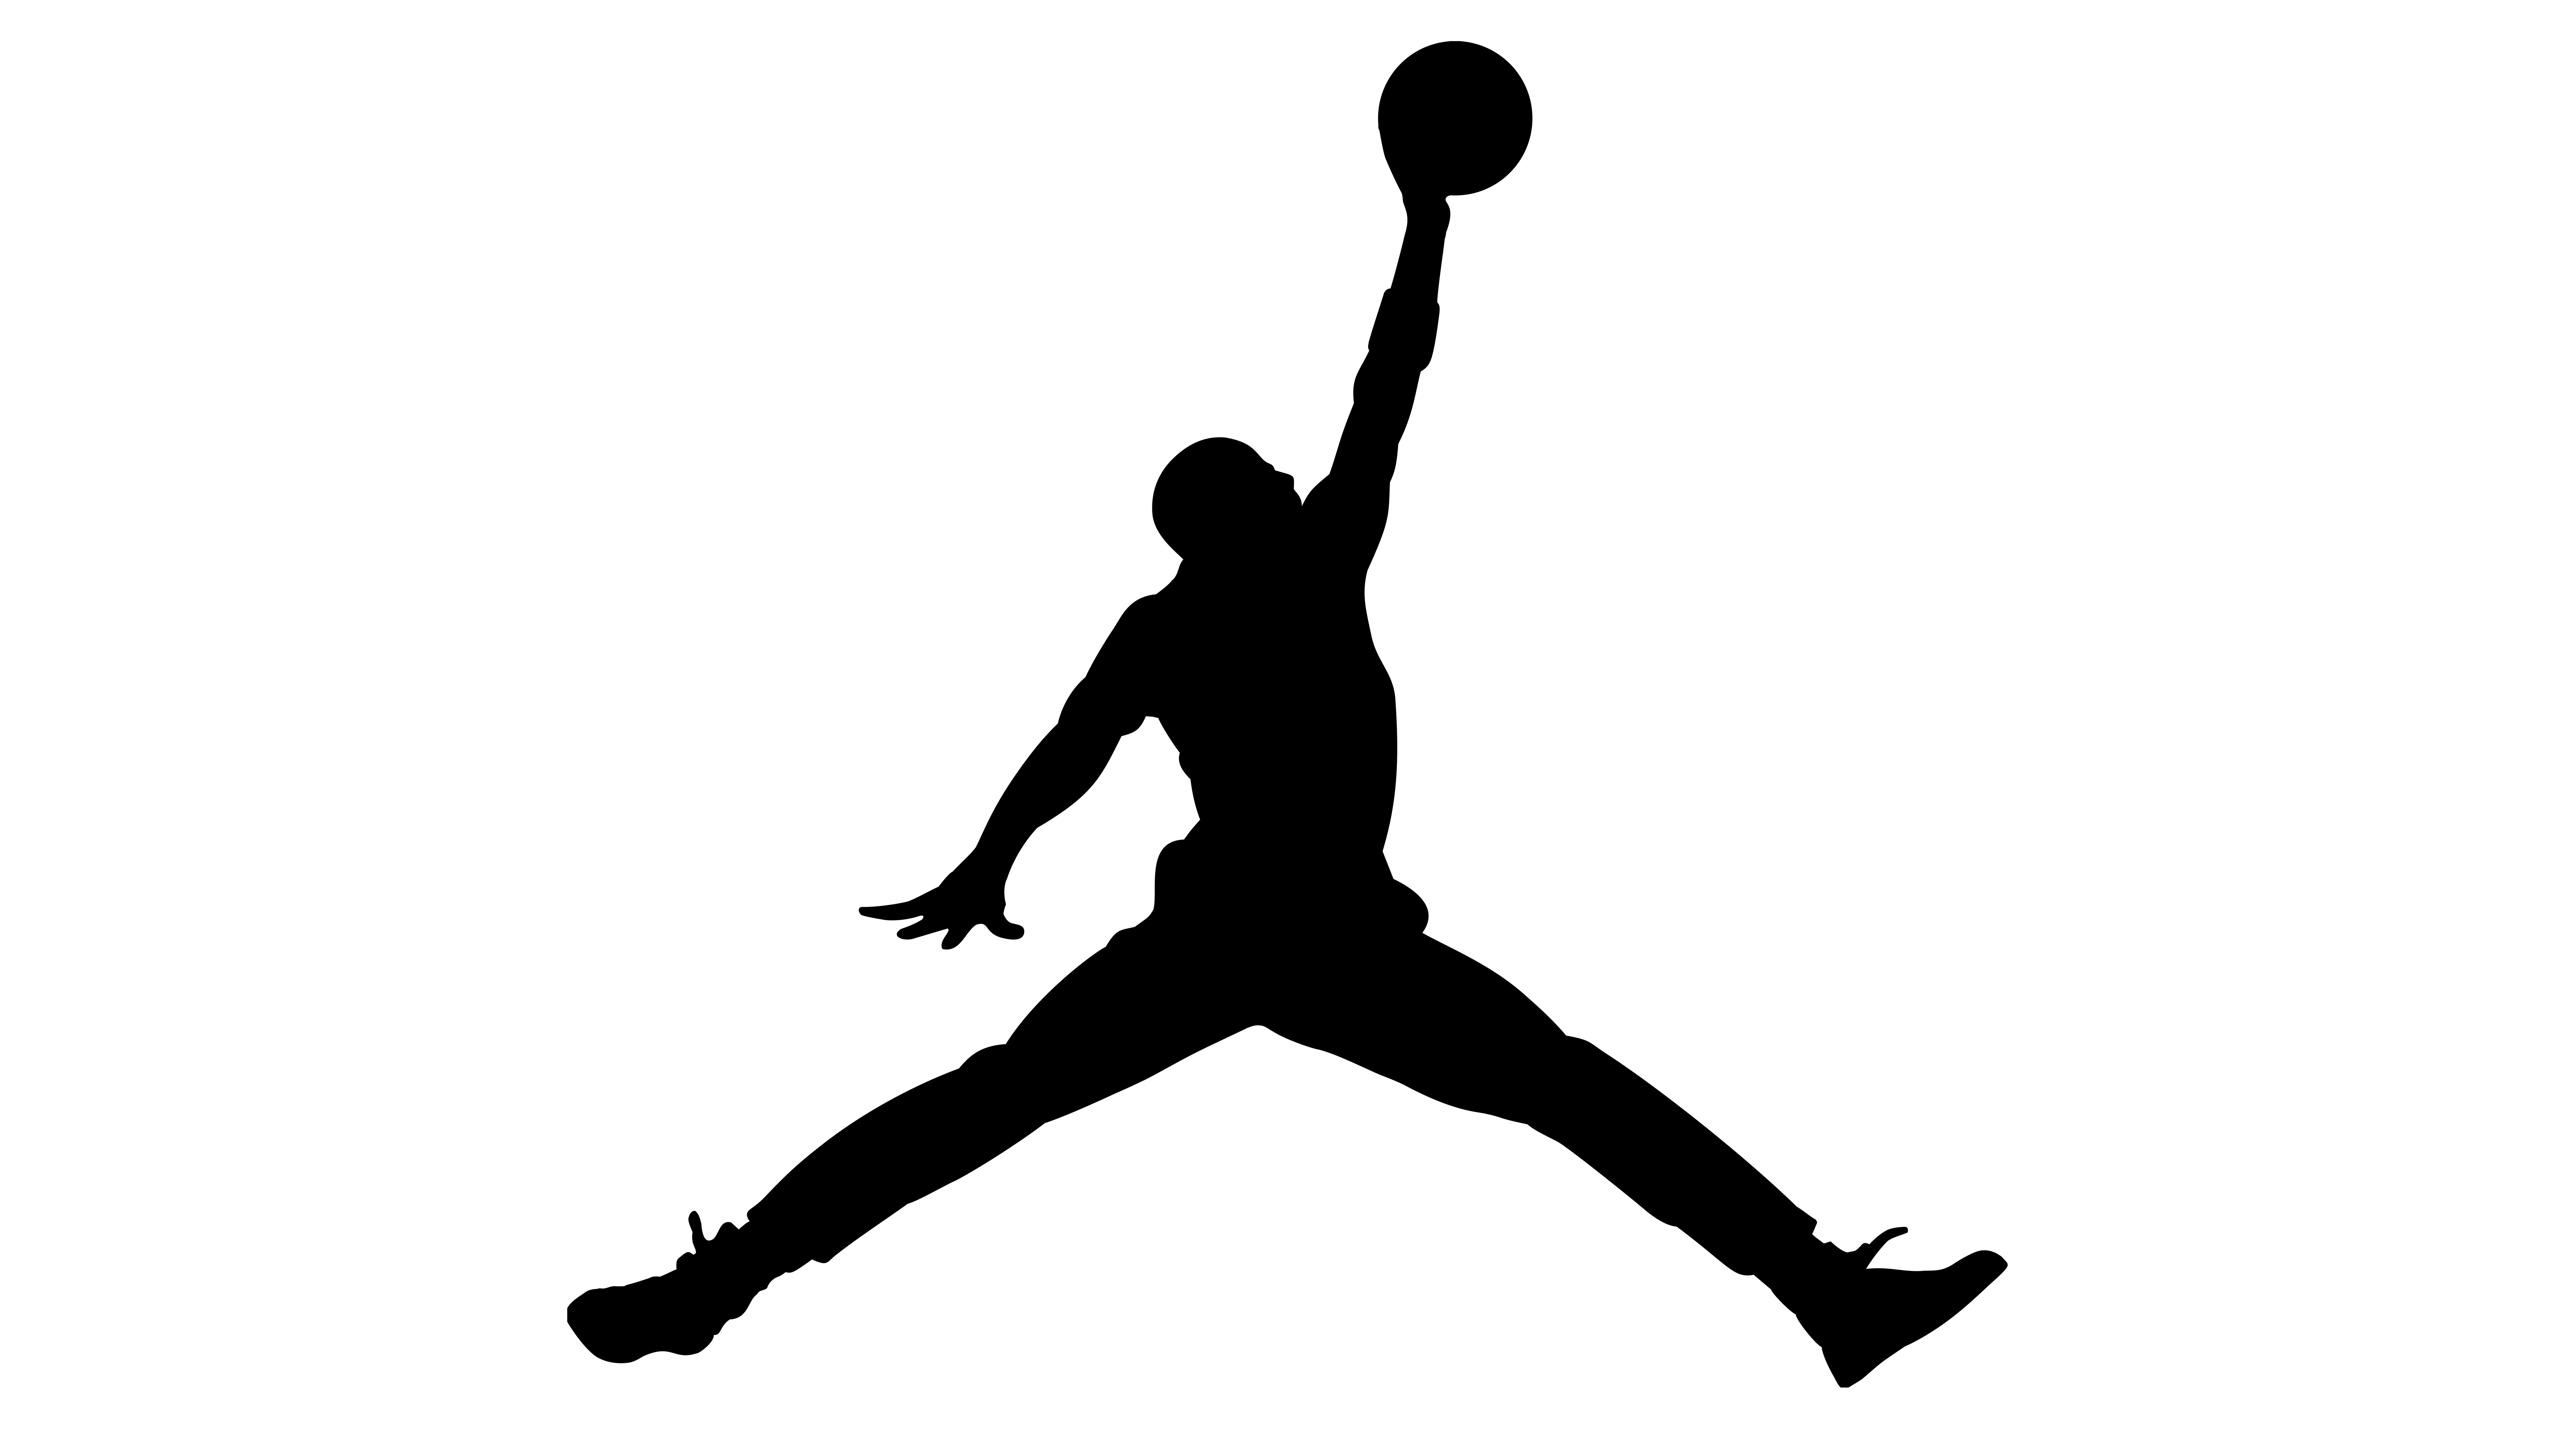 nike, jumpman, jordan brand, michael jordan, court battles, lawsuit, logo, copyright